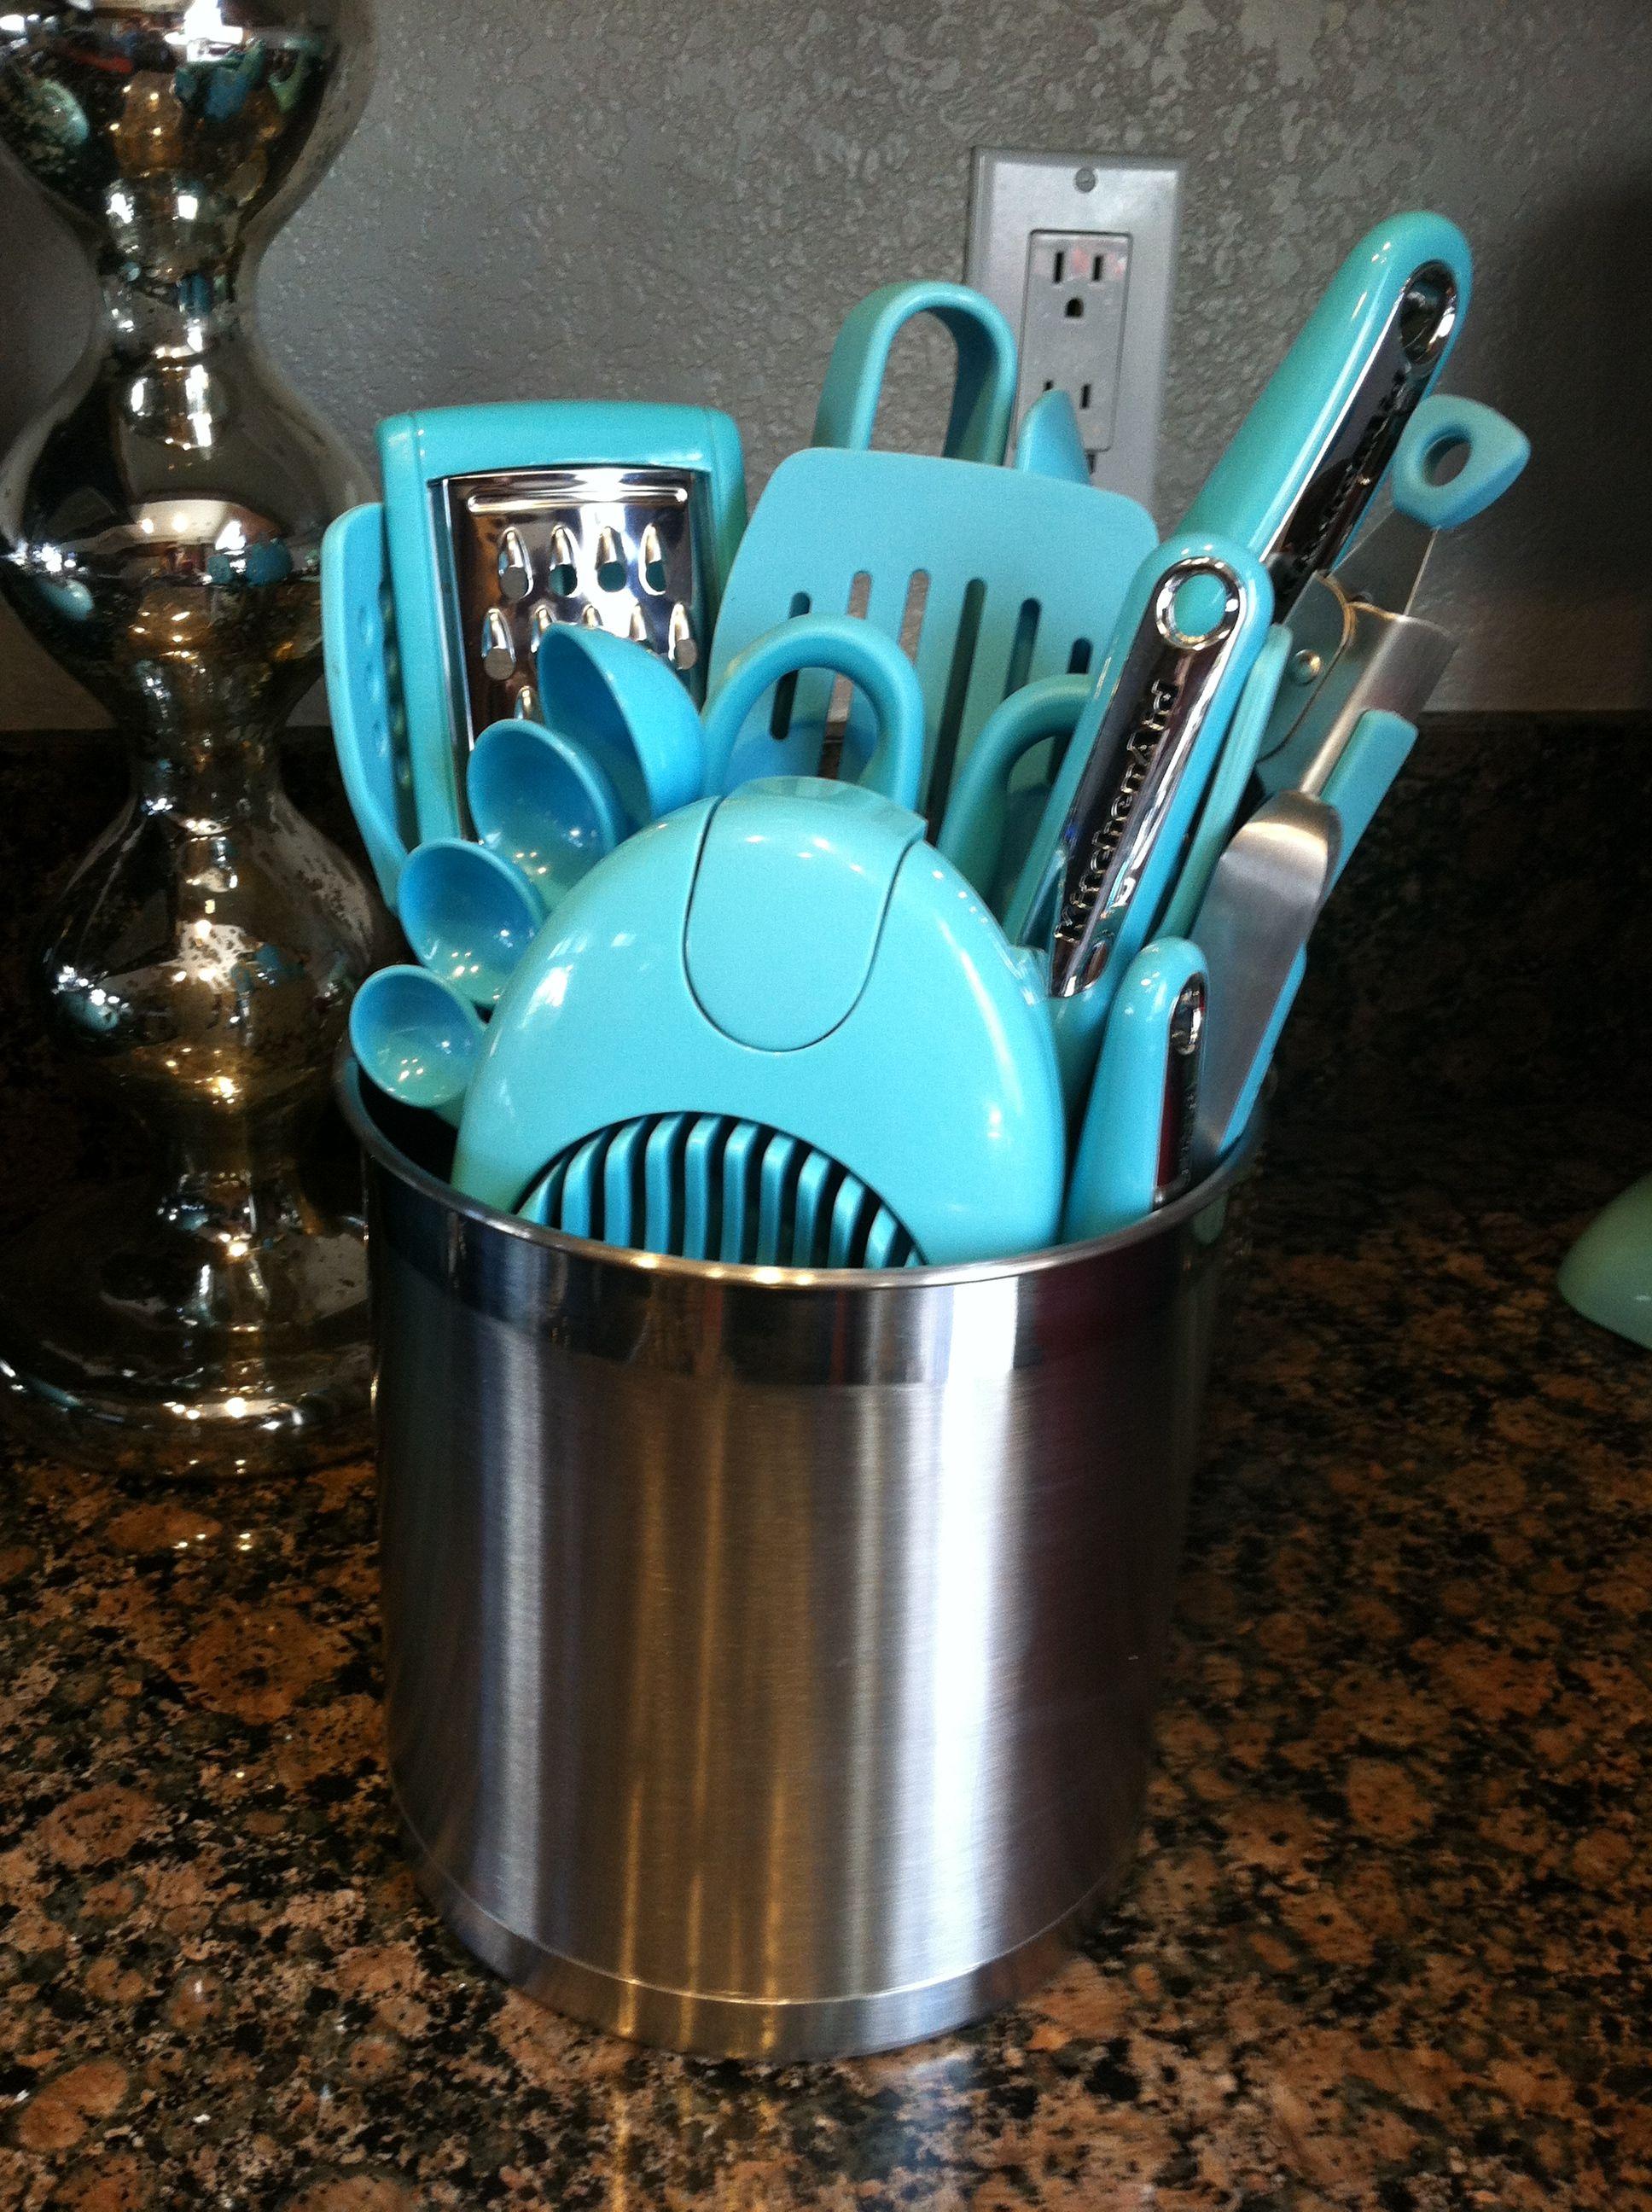 #KitchenAid #aqua Utensils I Have This Whole Set :)